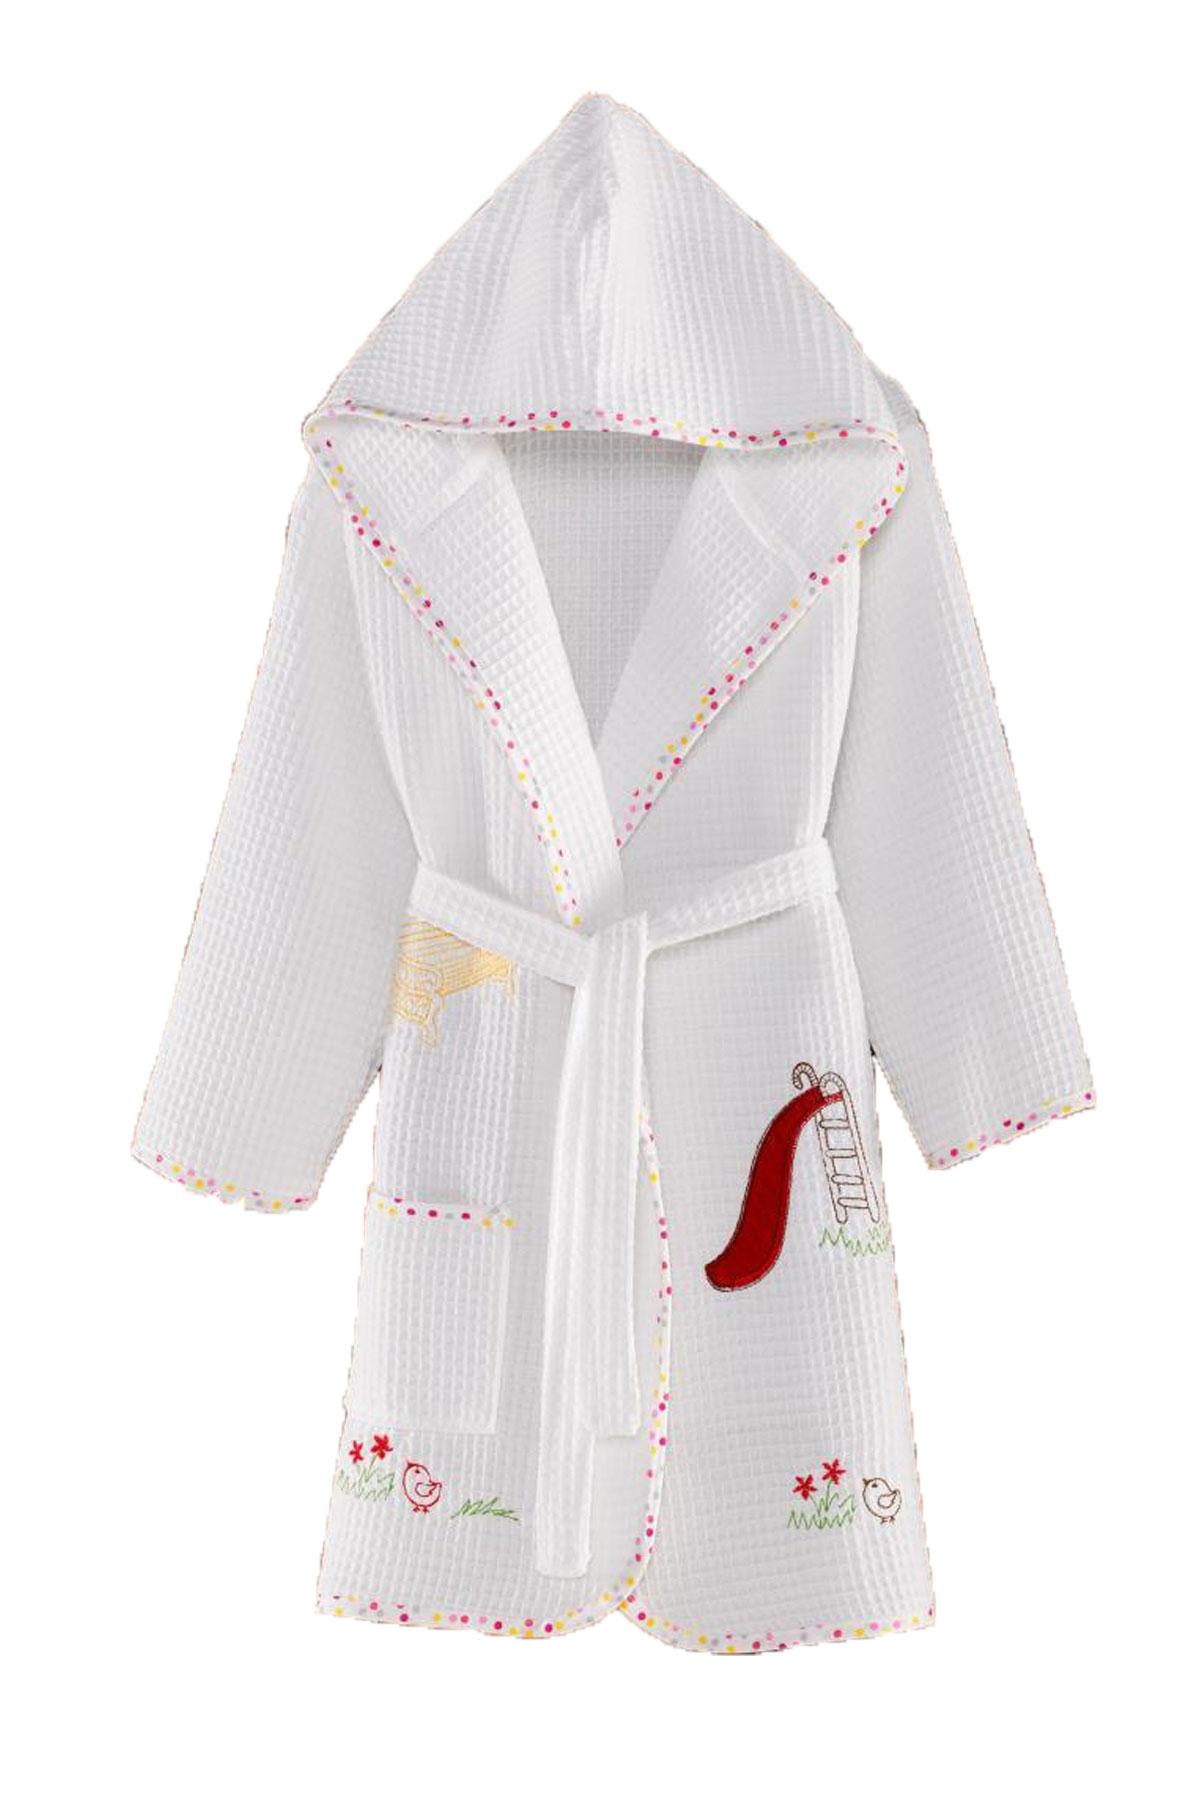 Girl's Teddy Bear Embroidered Cotton Pique Bathrobe (Ages 1-8)